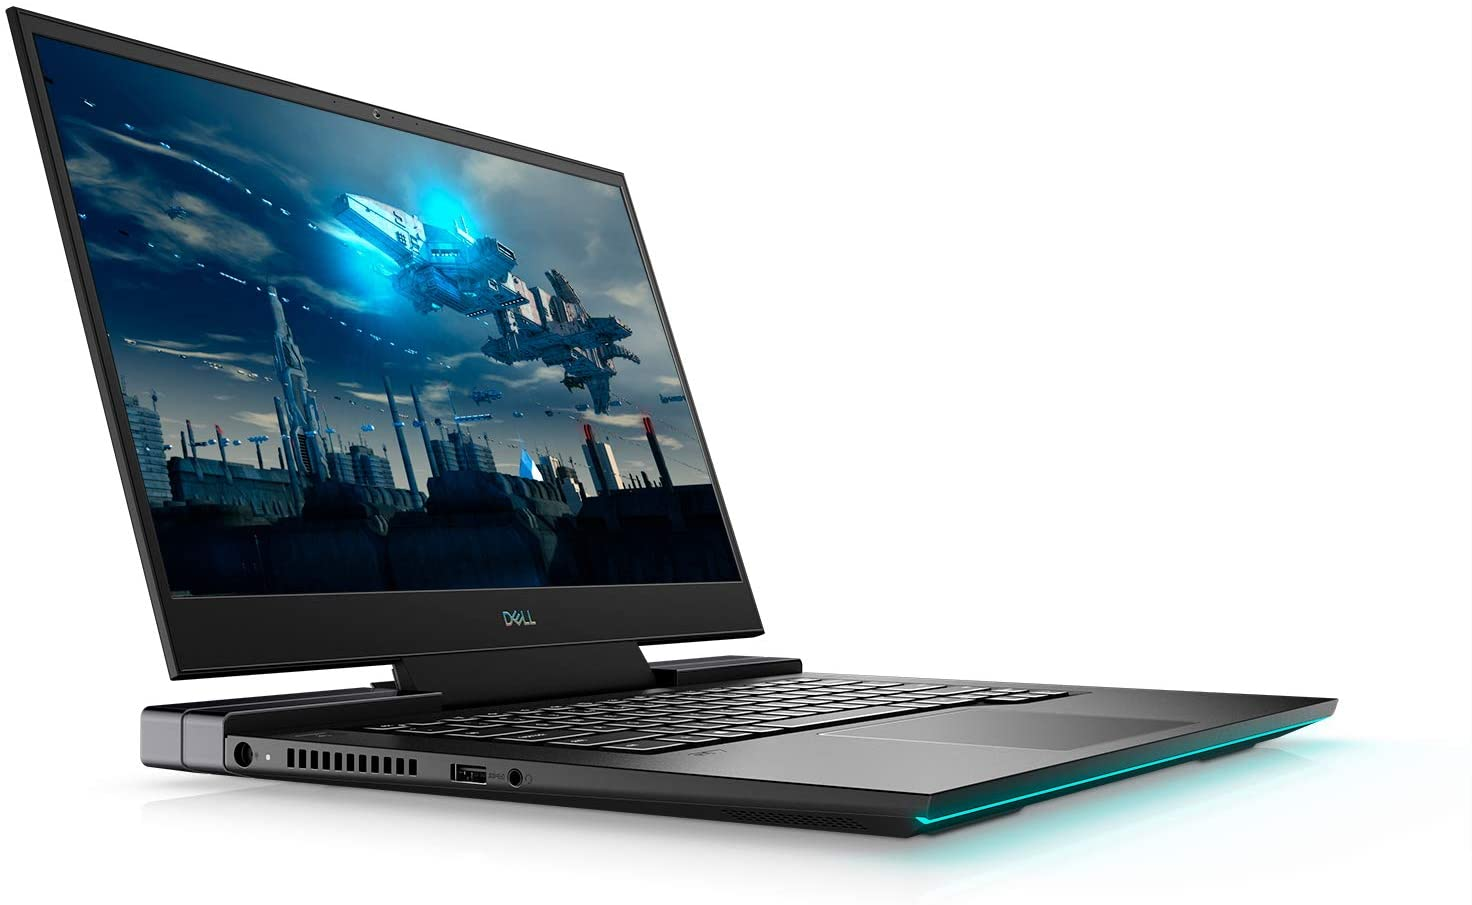 "New G7 17 Epic Gaming Laptop 10th Gen Intel i7-10750H up to 5.0 GHz, GeForce RTX 2070 8GB 17.3"" FHD 300 nits WVA AG Display 300Hz (2TB SSD|32GB Ram|10 Pro)"